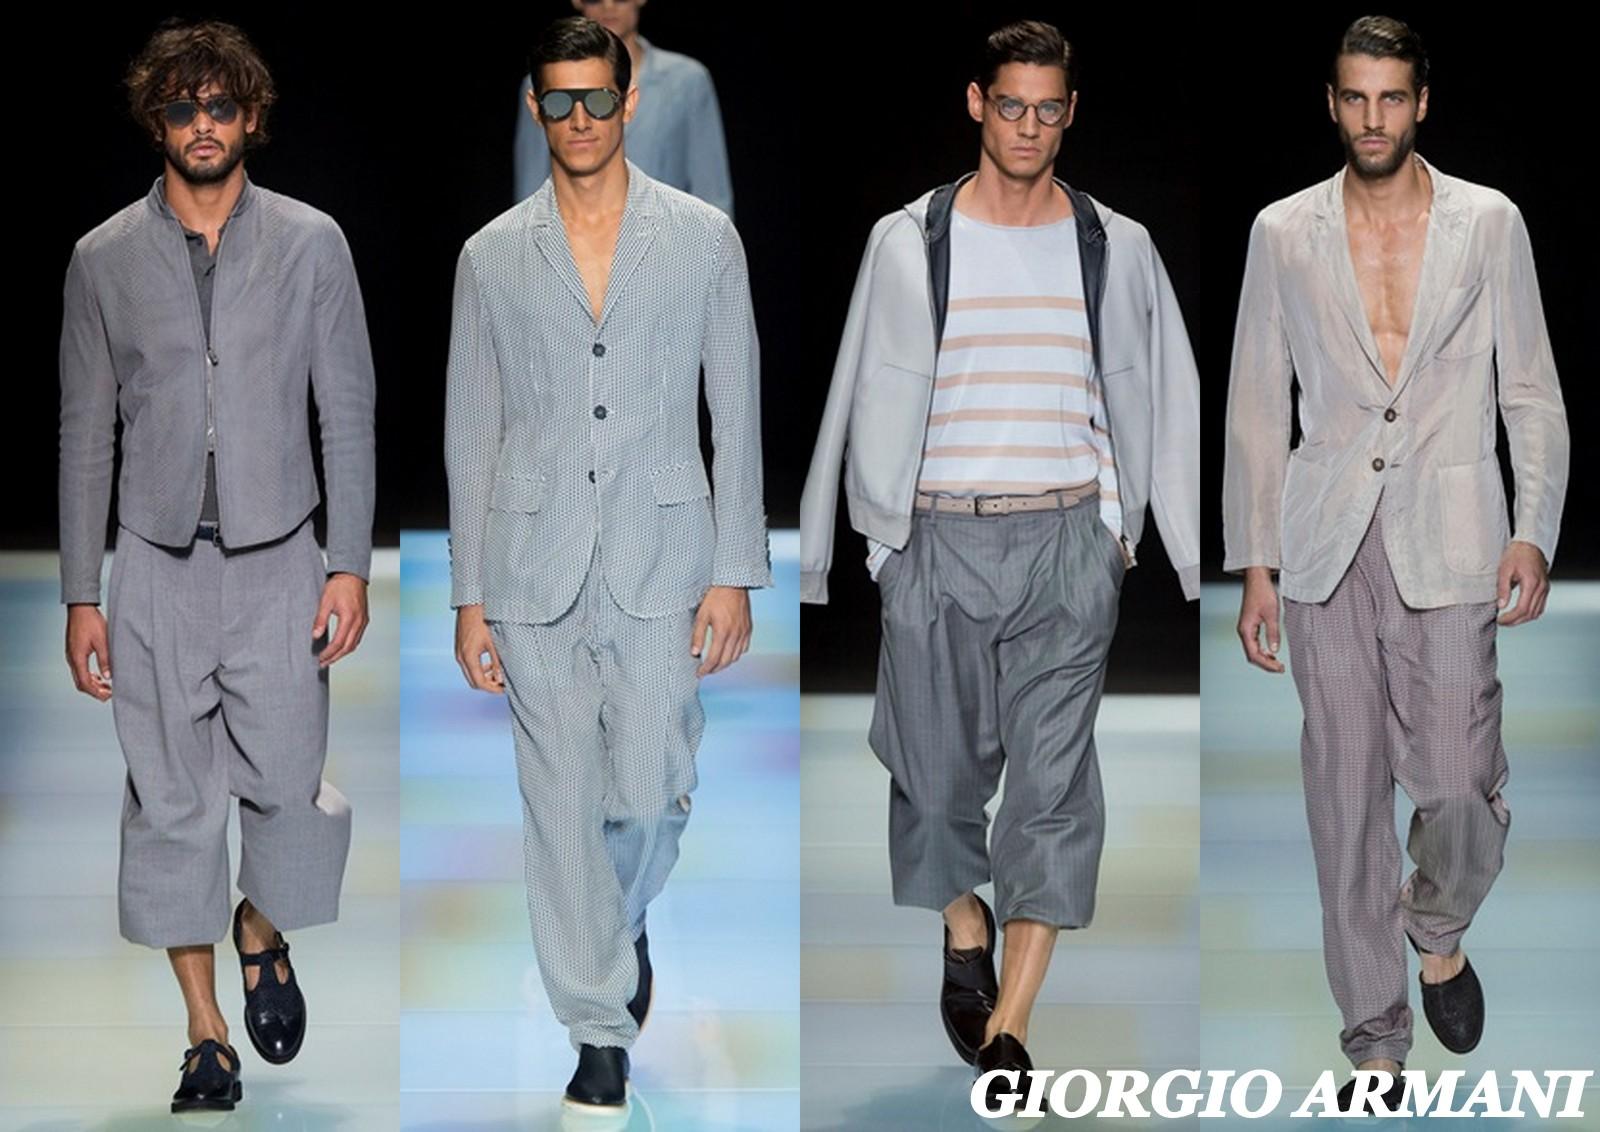 Giorgio Armani SS16 , Menswear , Marlon Texeira , Milan Fashion Week